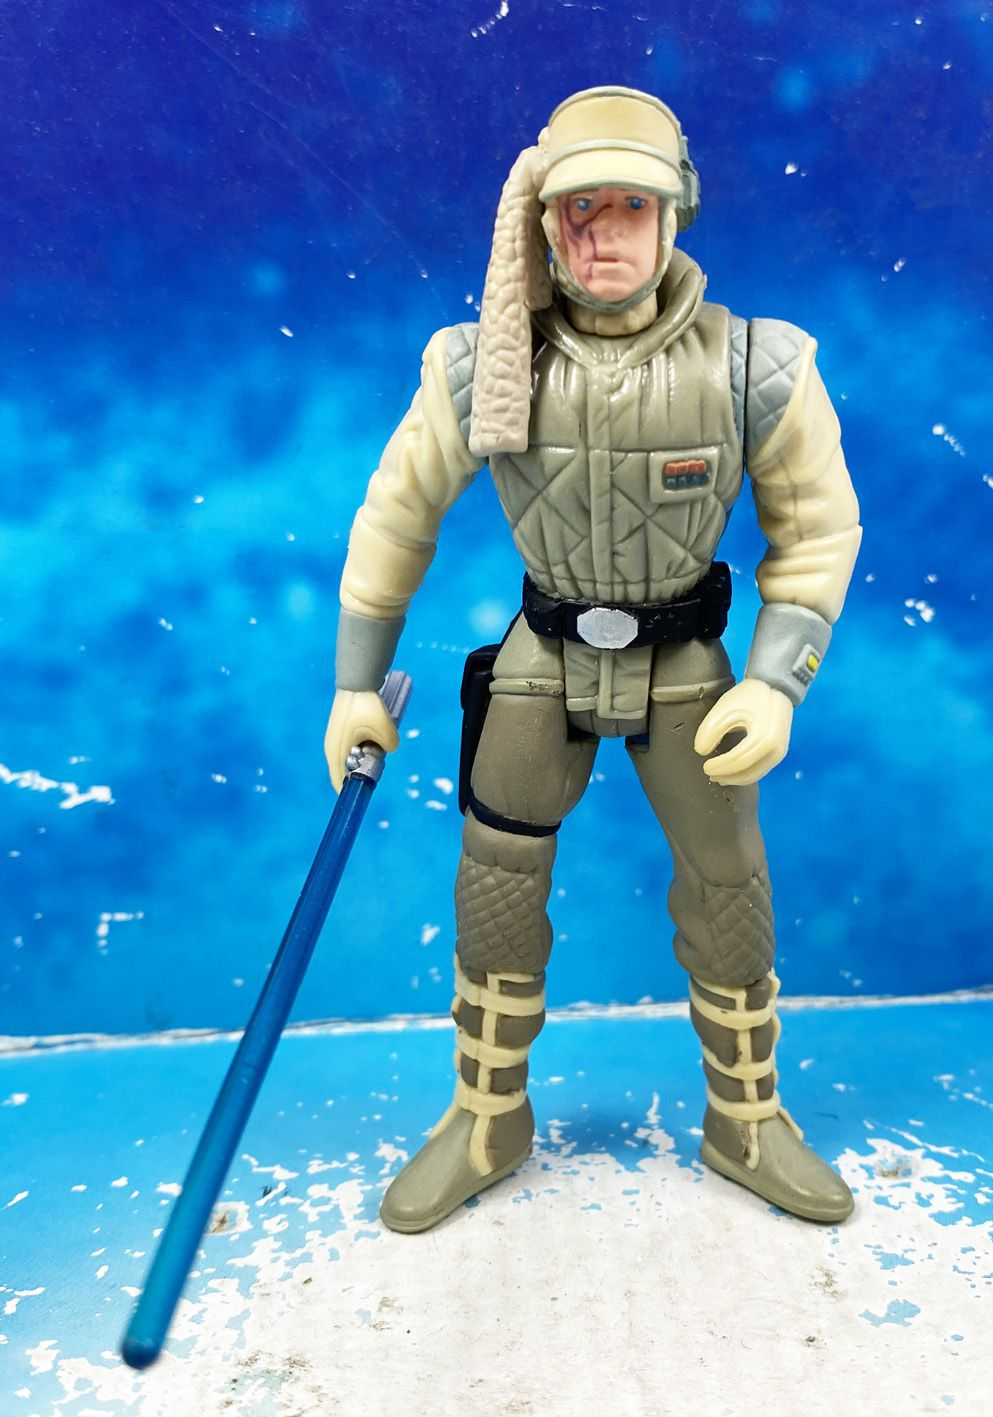 Star Wars (Loose) - Kenner/Hasbro - Luke Skywalker (With Wampa) POTF2